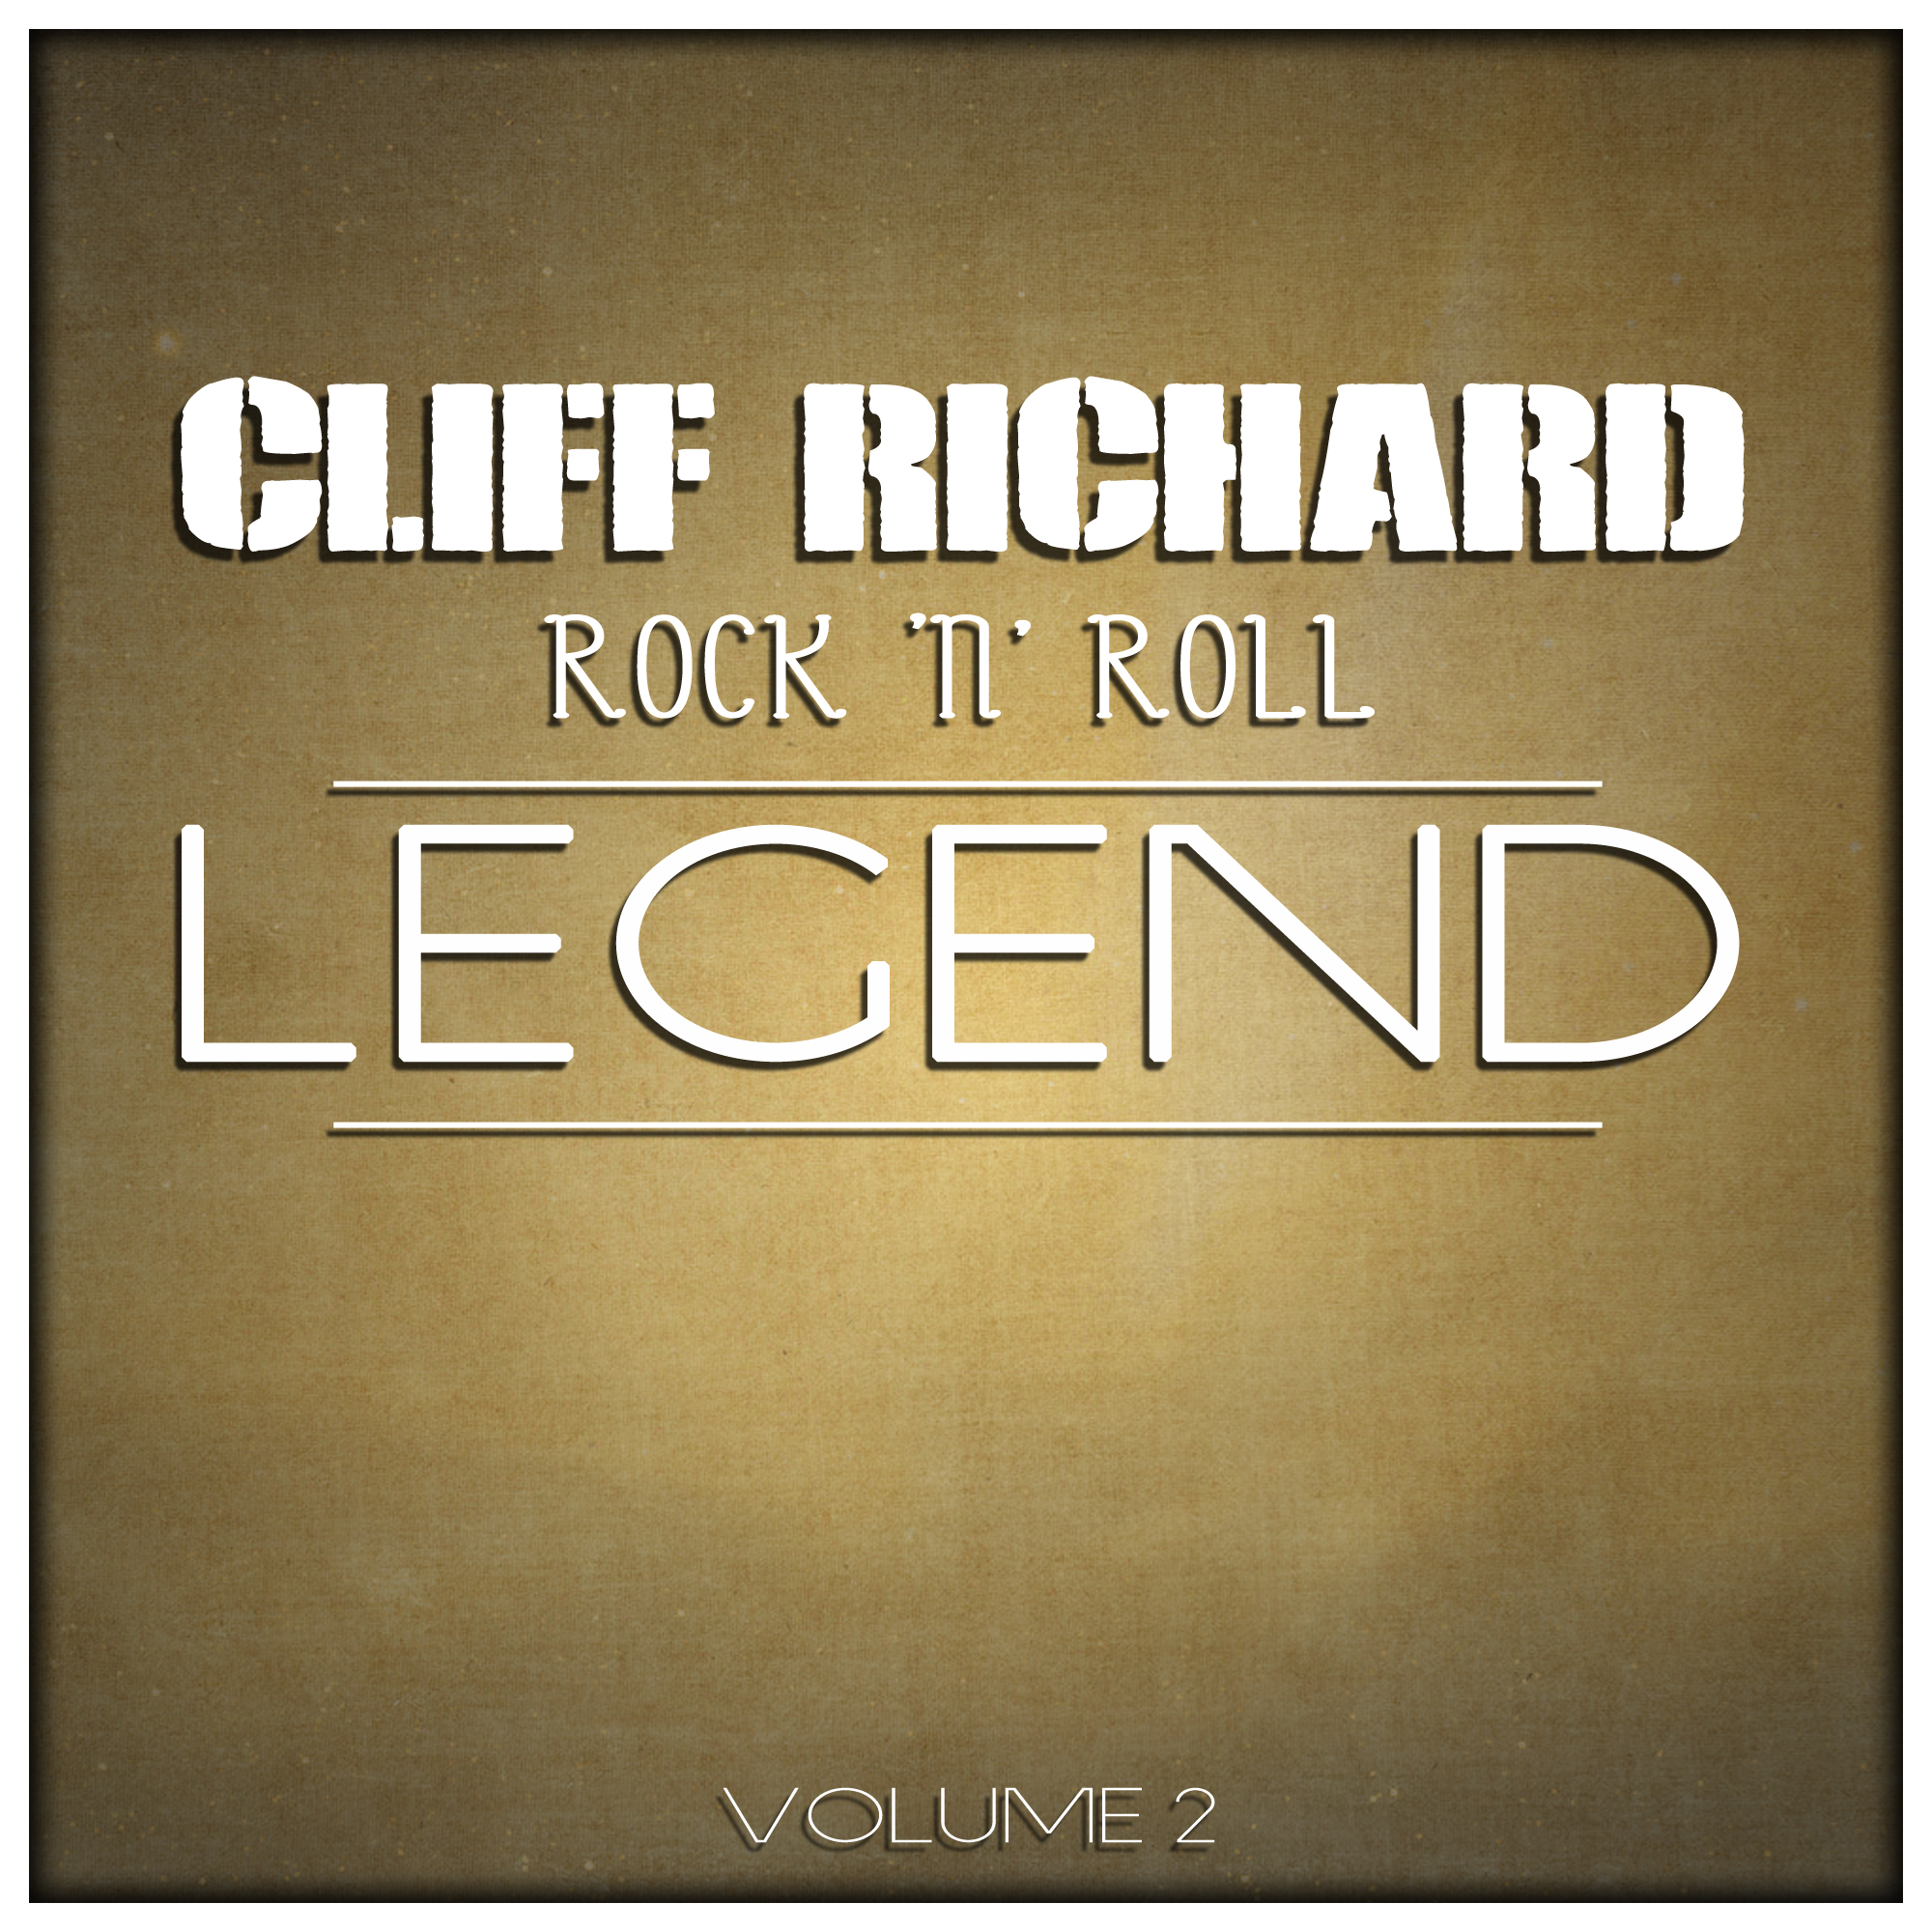 Cliff Richard - Rock 'n' Roll Legend - Volume 2